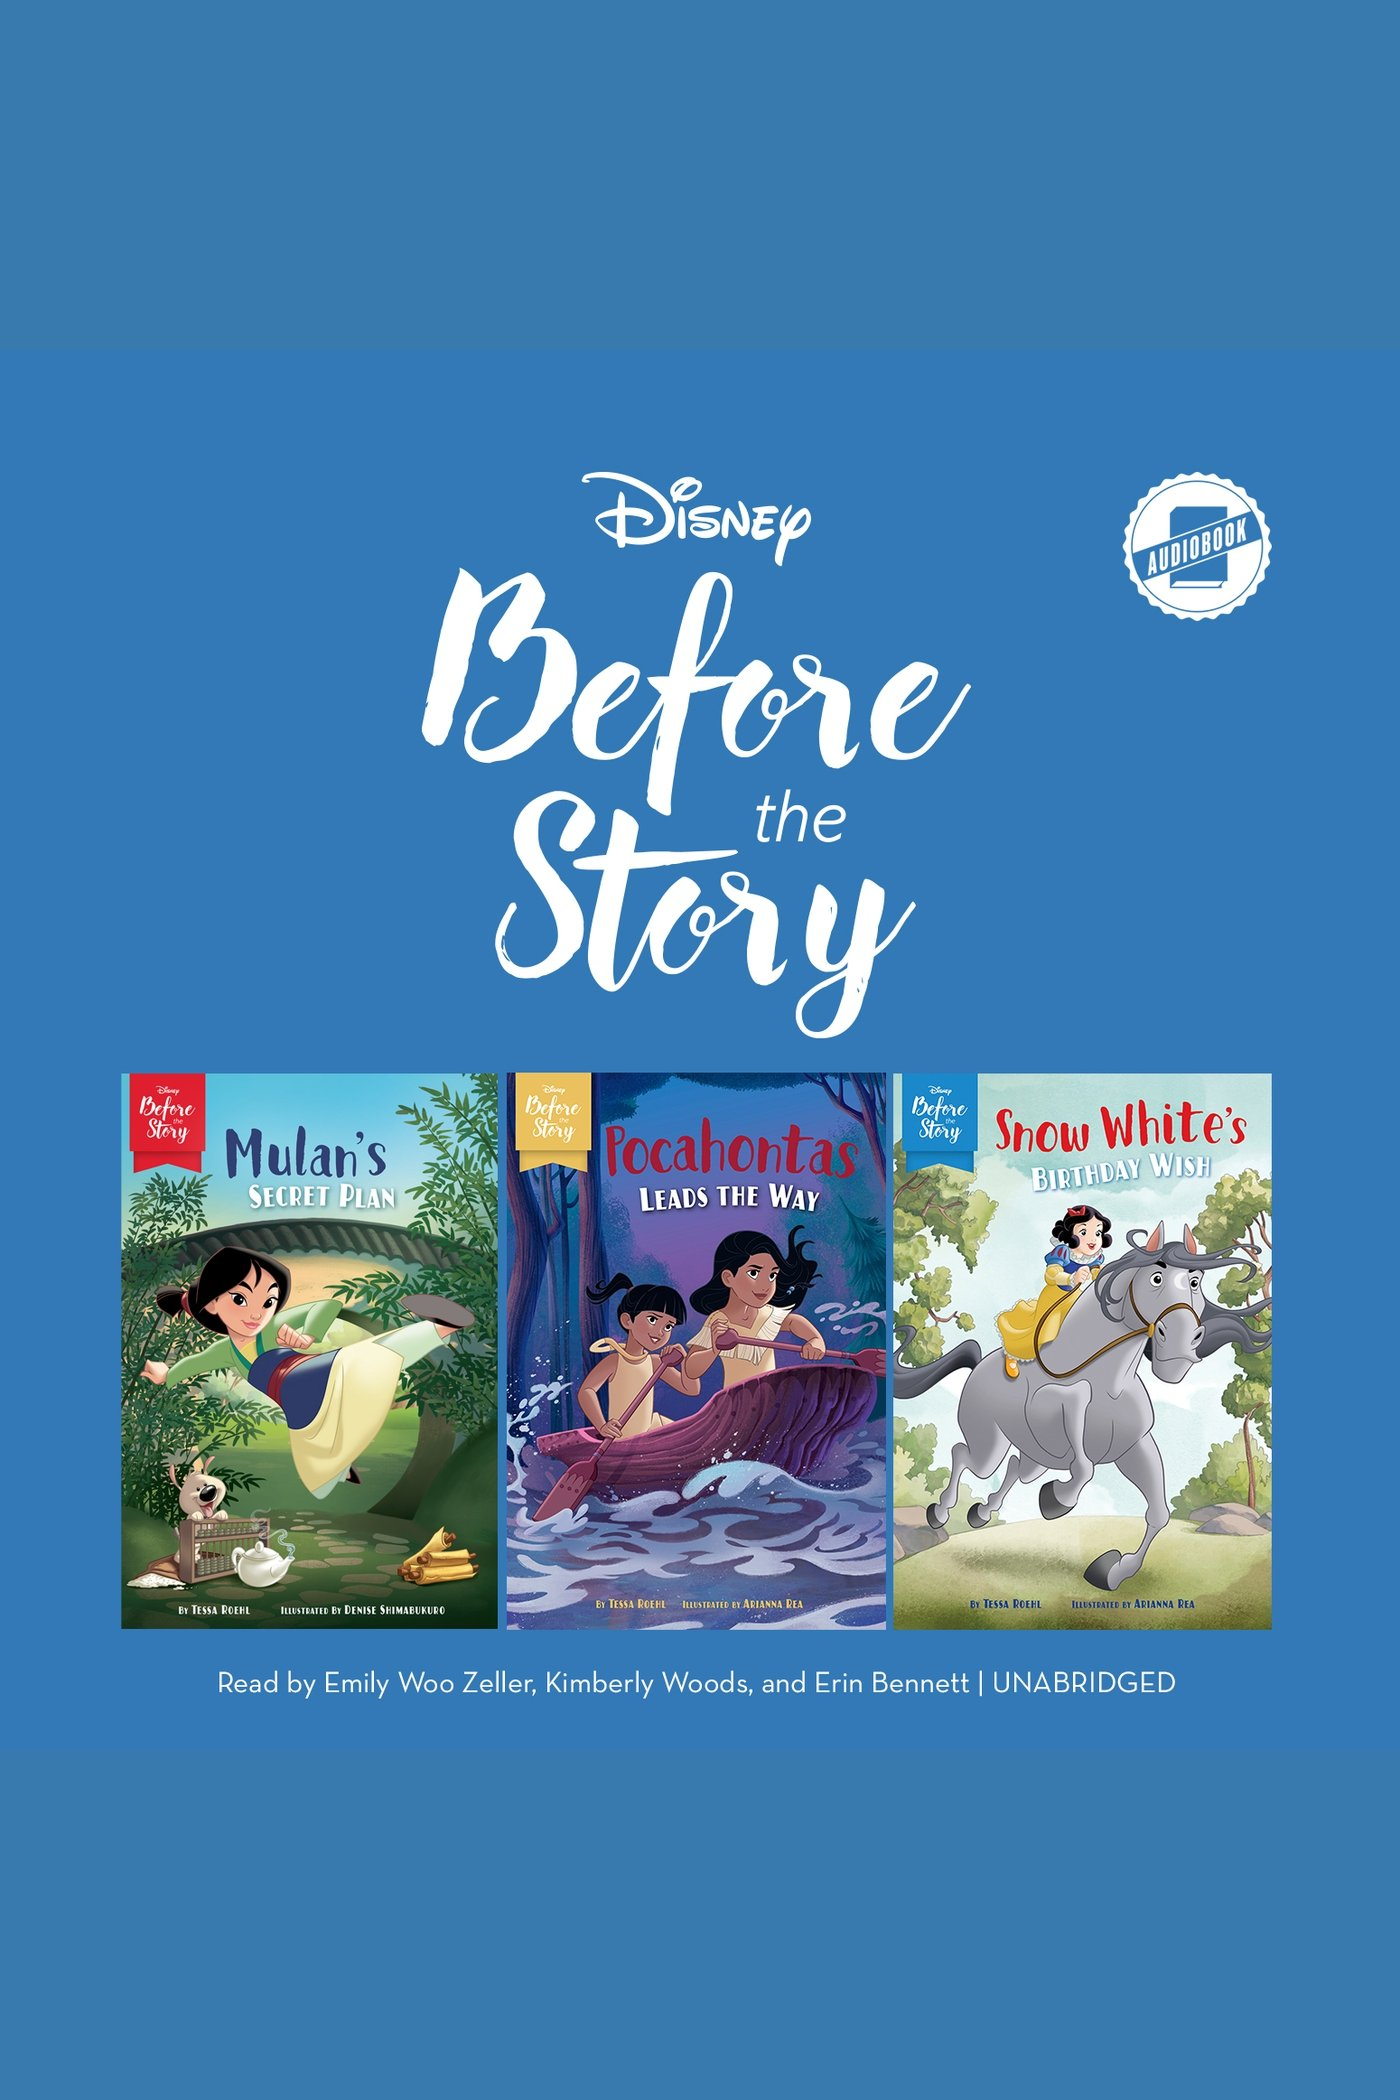 Disney Before the Story: Mulan, Pocohontas & Snow White Mulan's Secret Plan, Pocahontas Leads the Way & Snow White's Birthday Wish